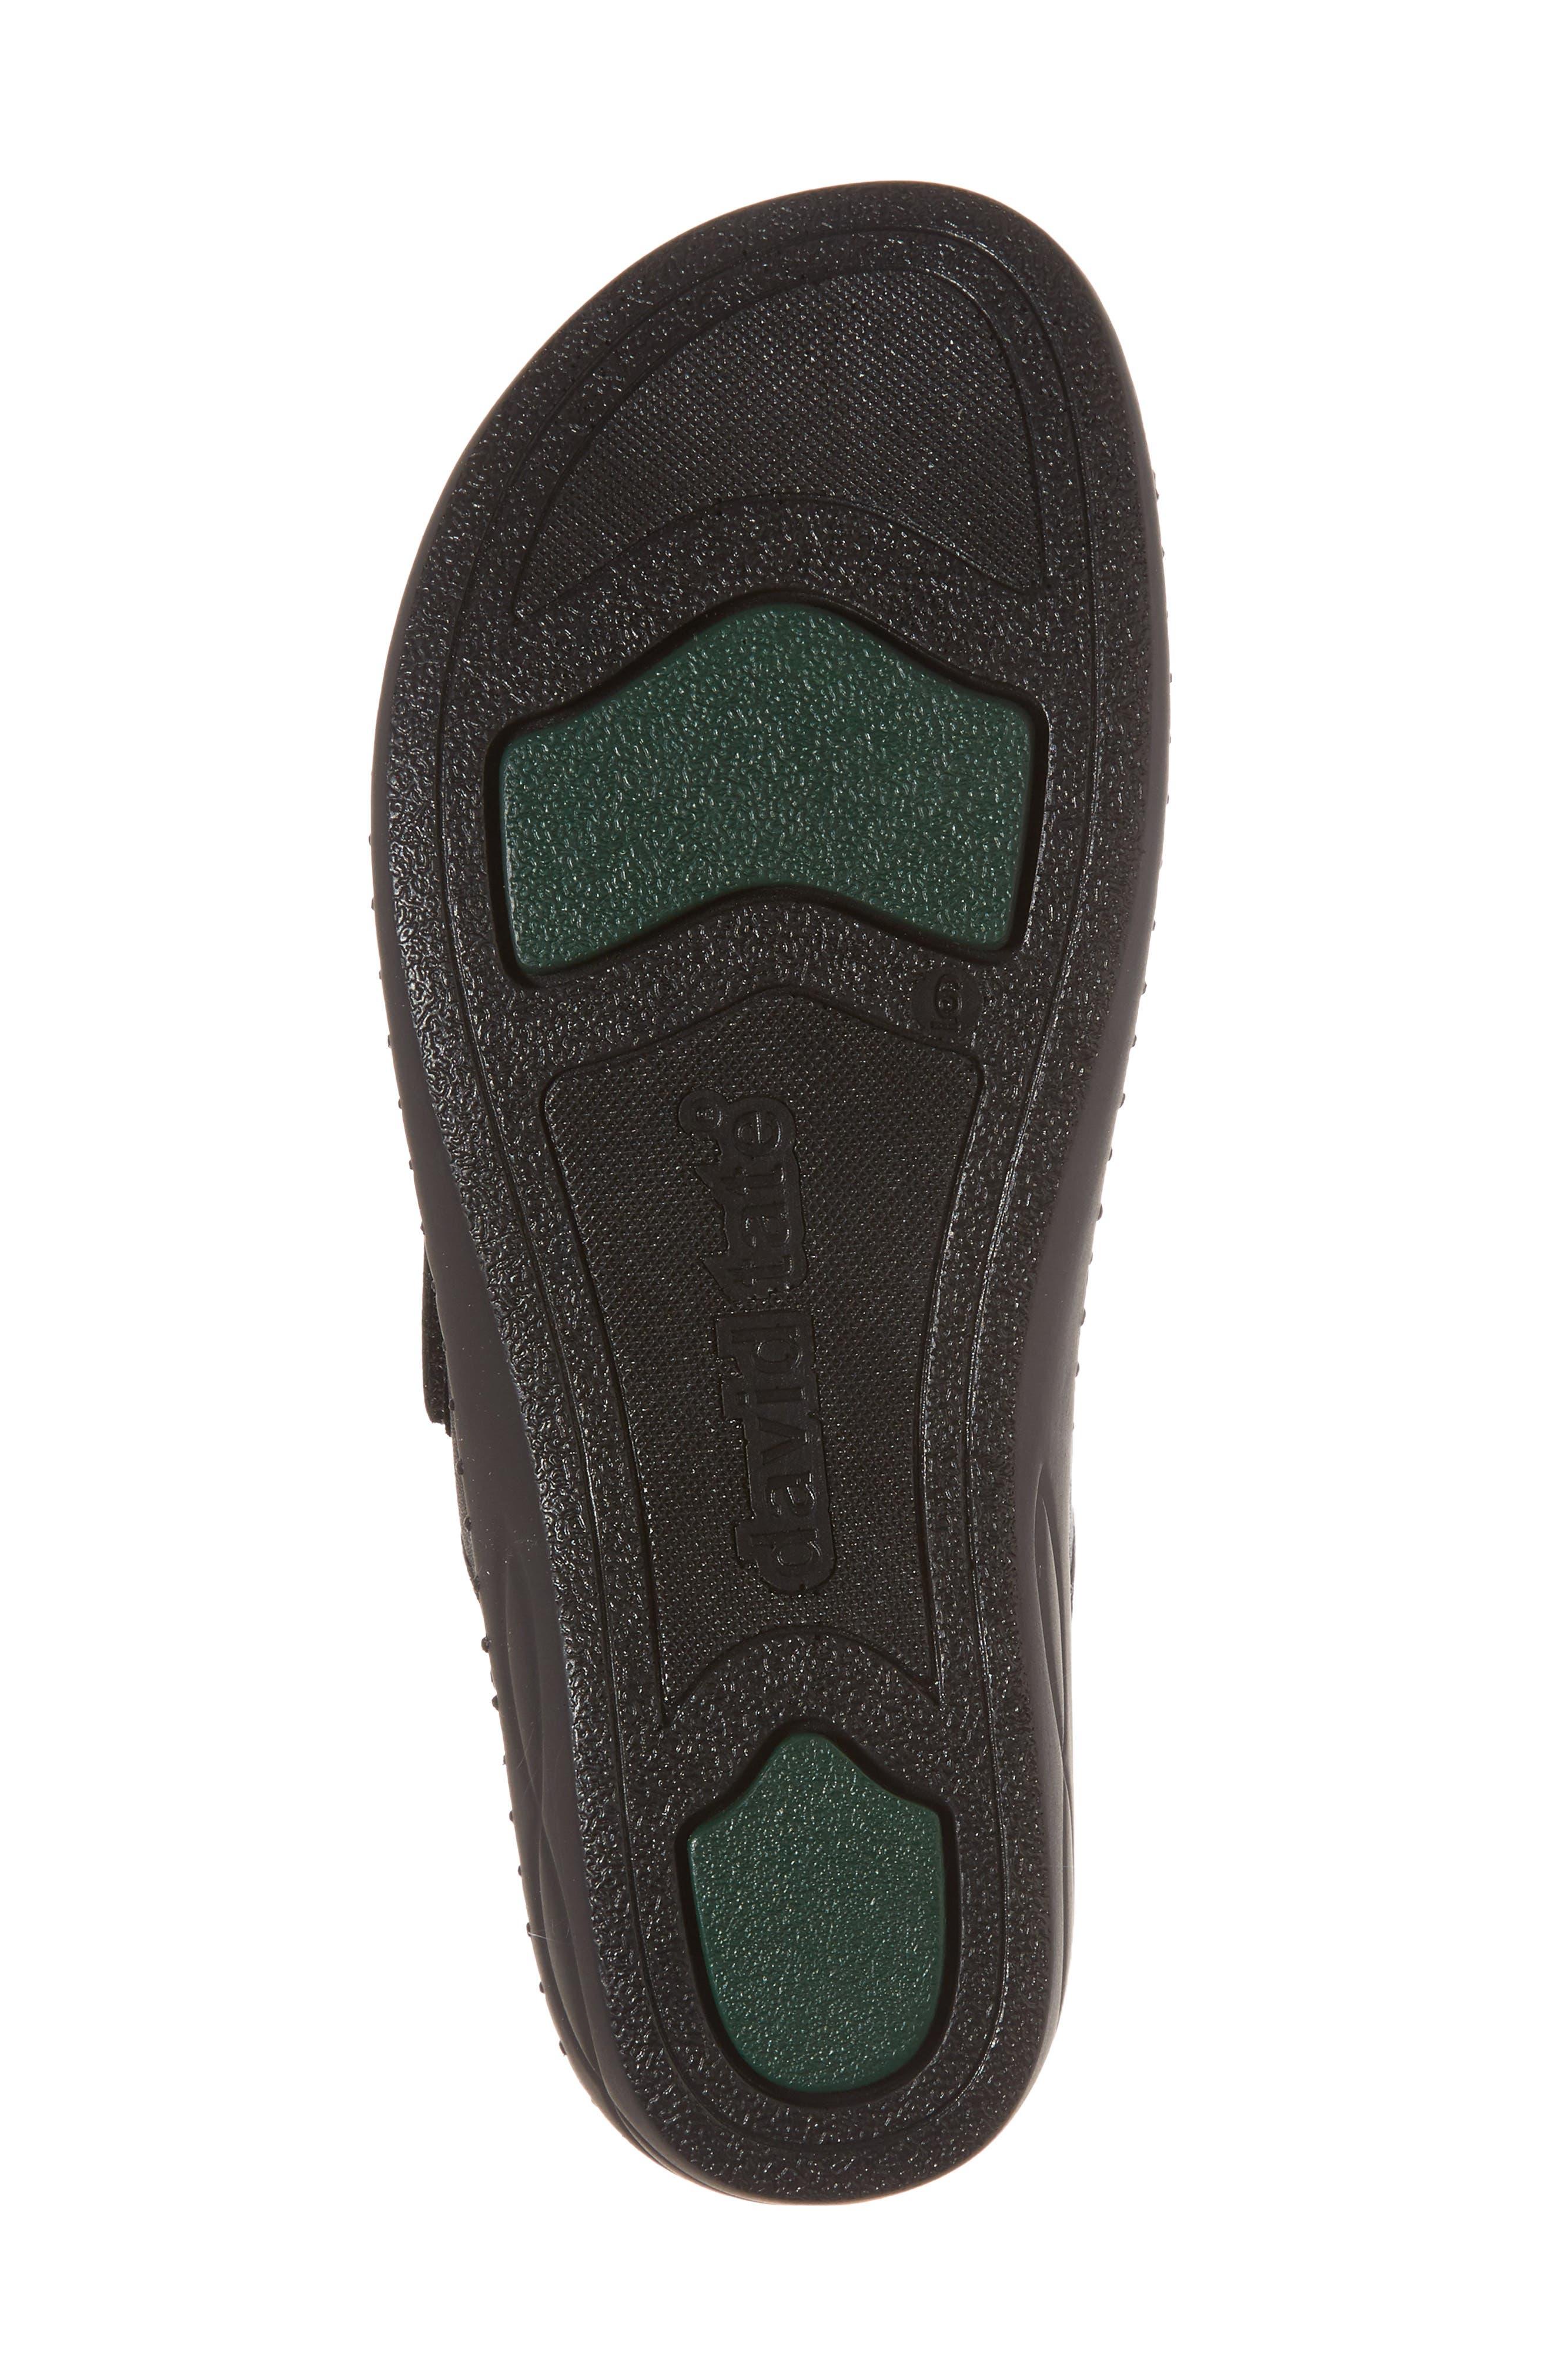 Sol Sandal,                             Alternate thumbnail 6, color,                             Black Leather